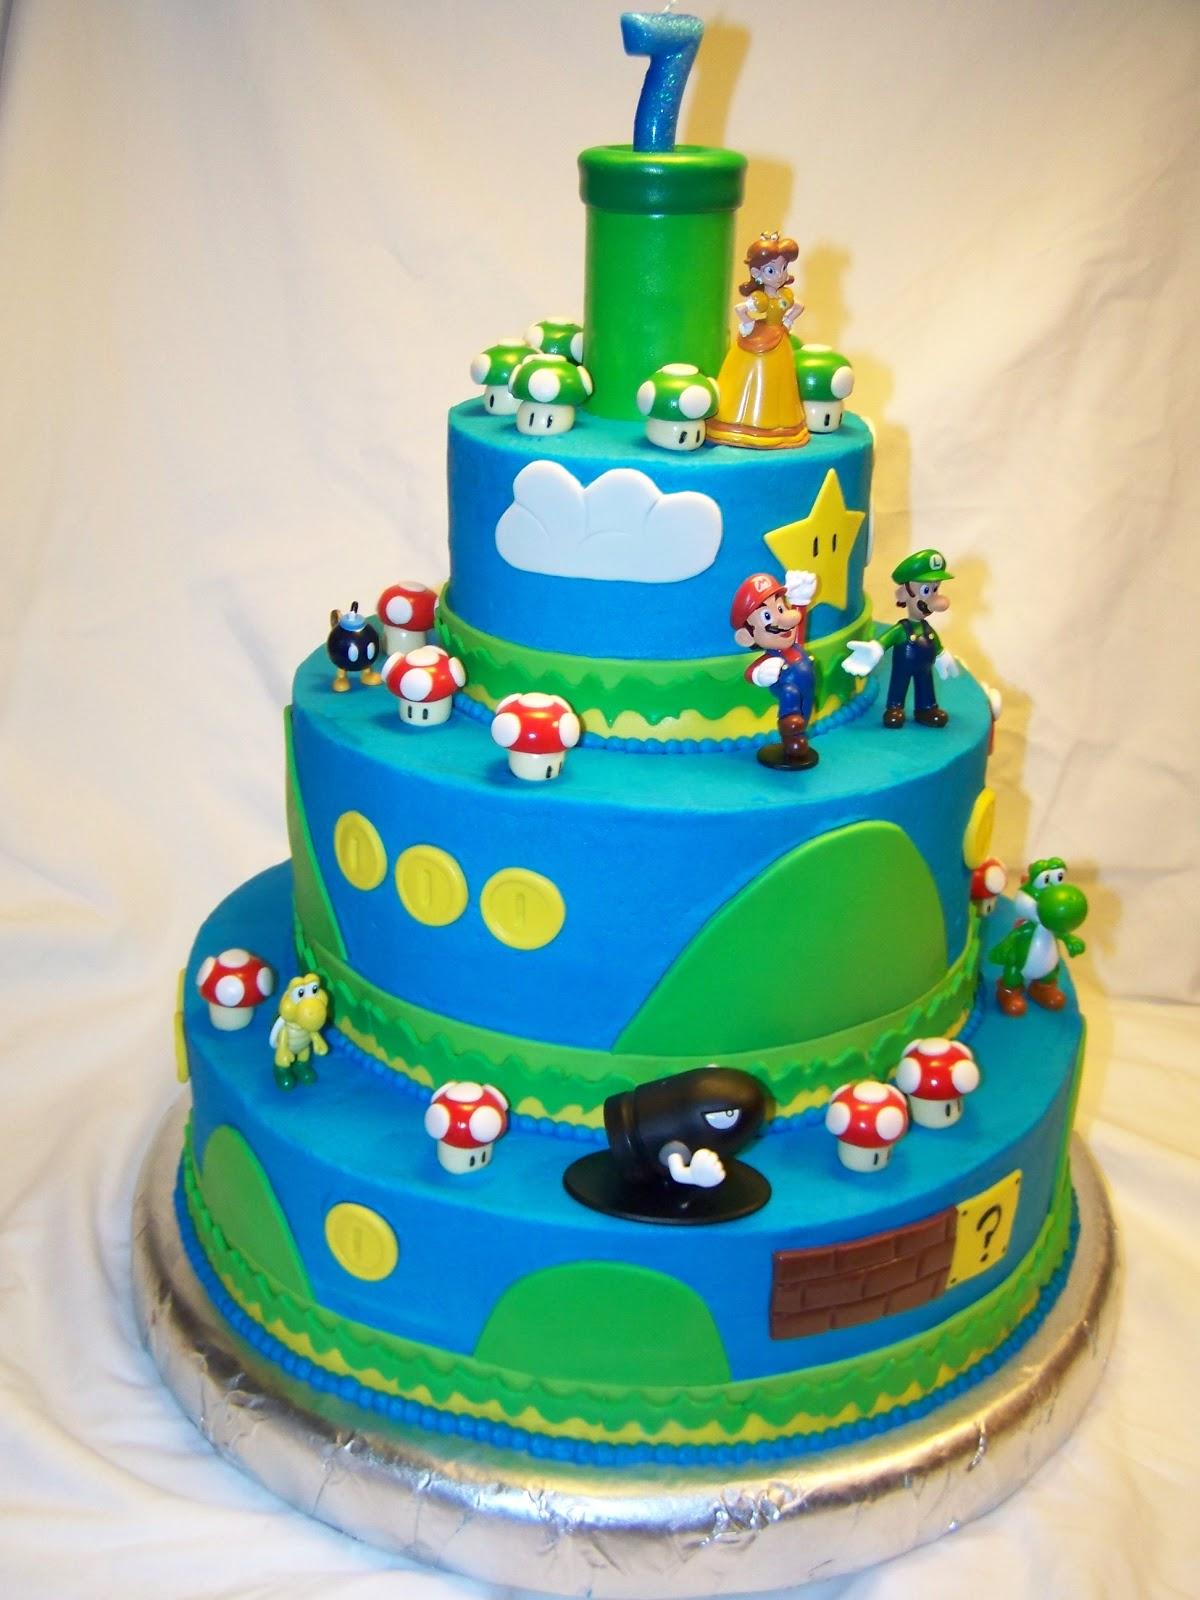 Video Game Birthday Cake Decorations